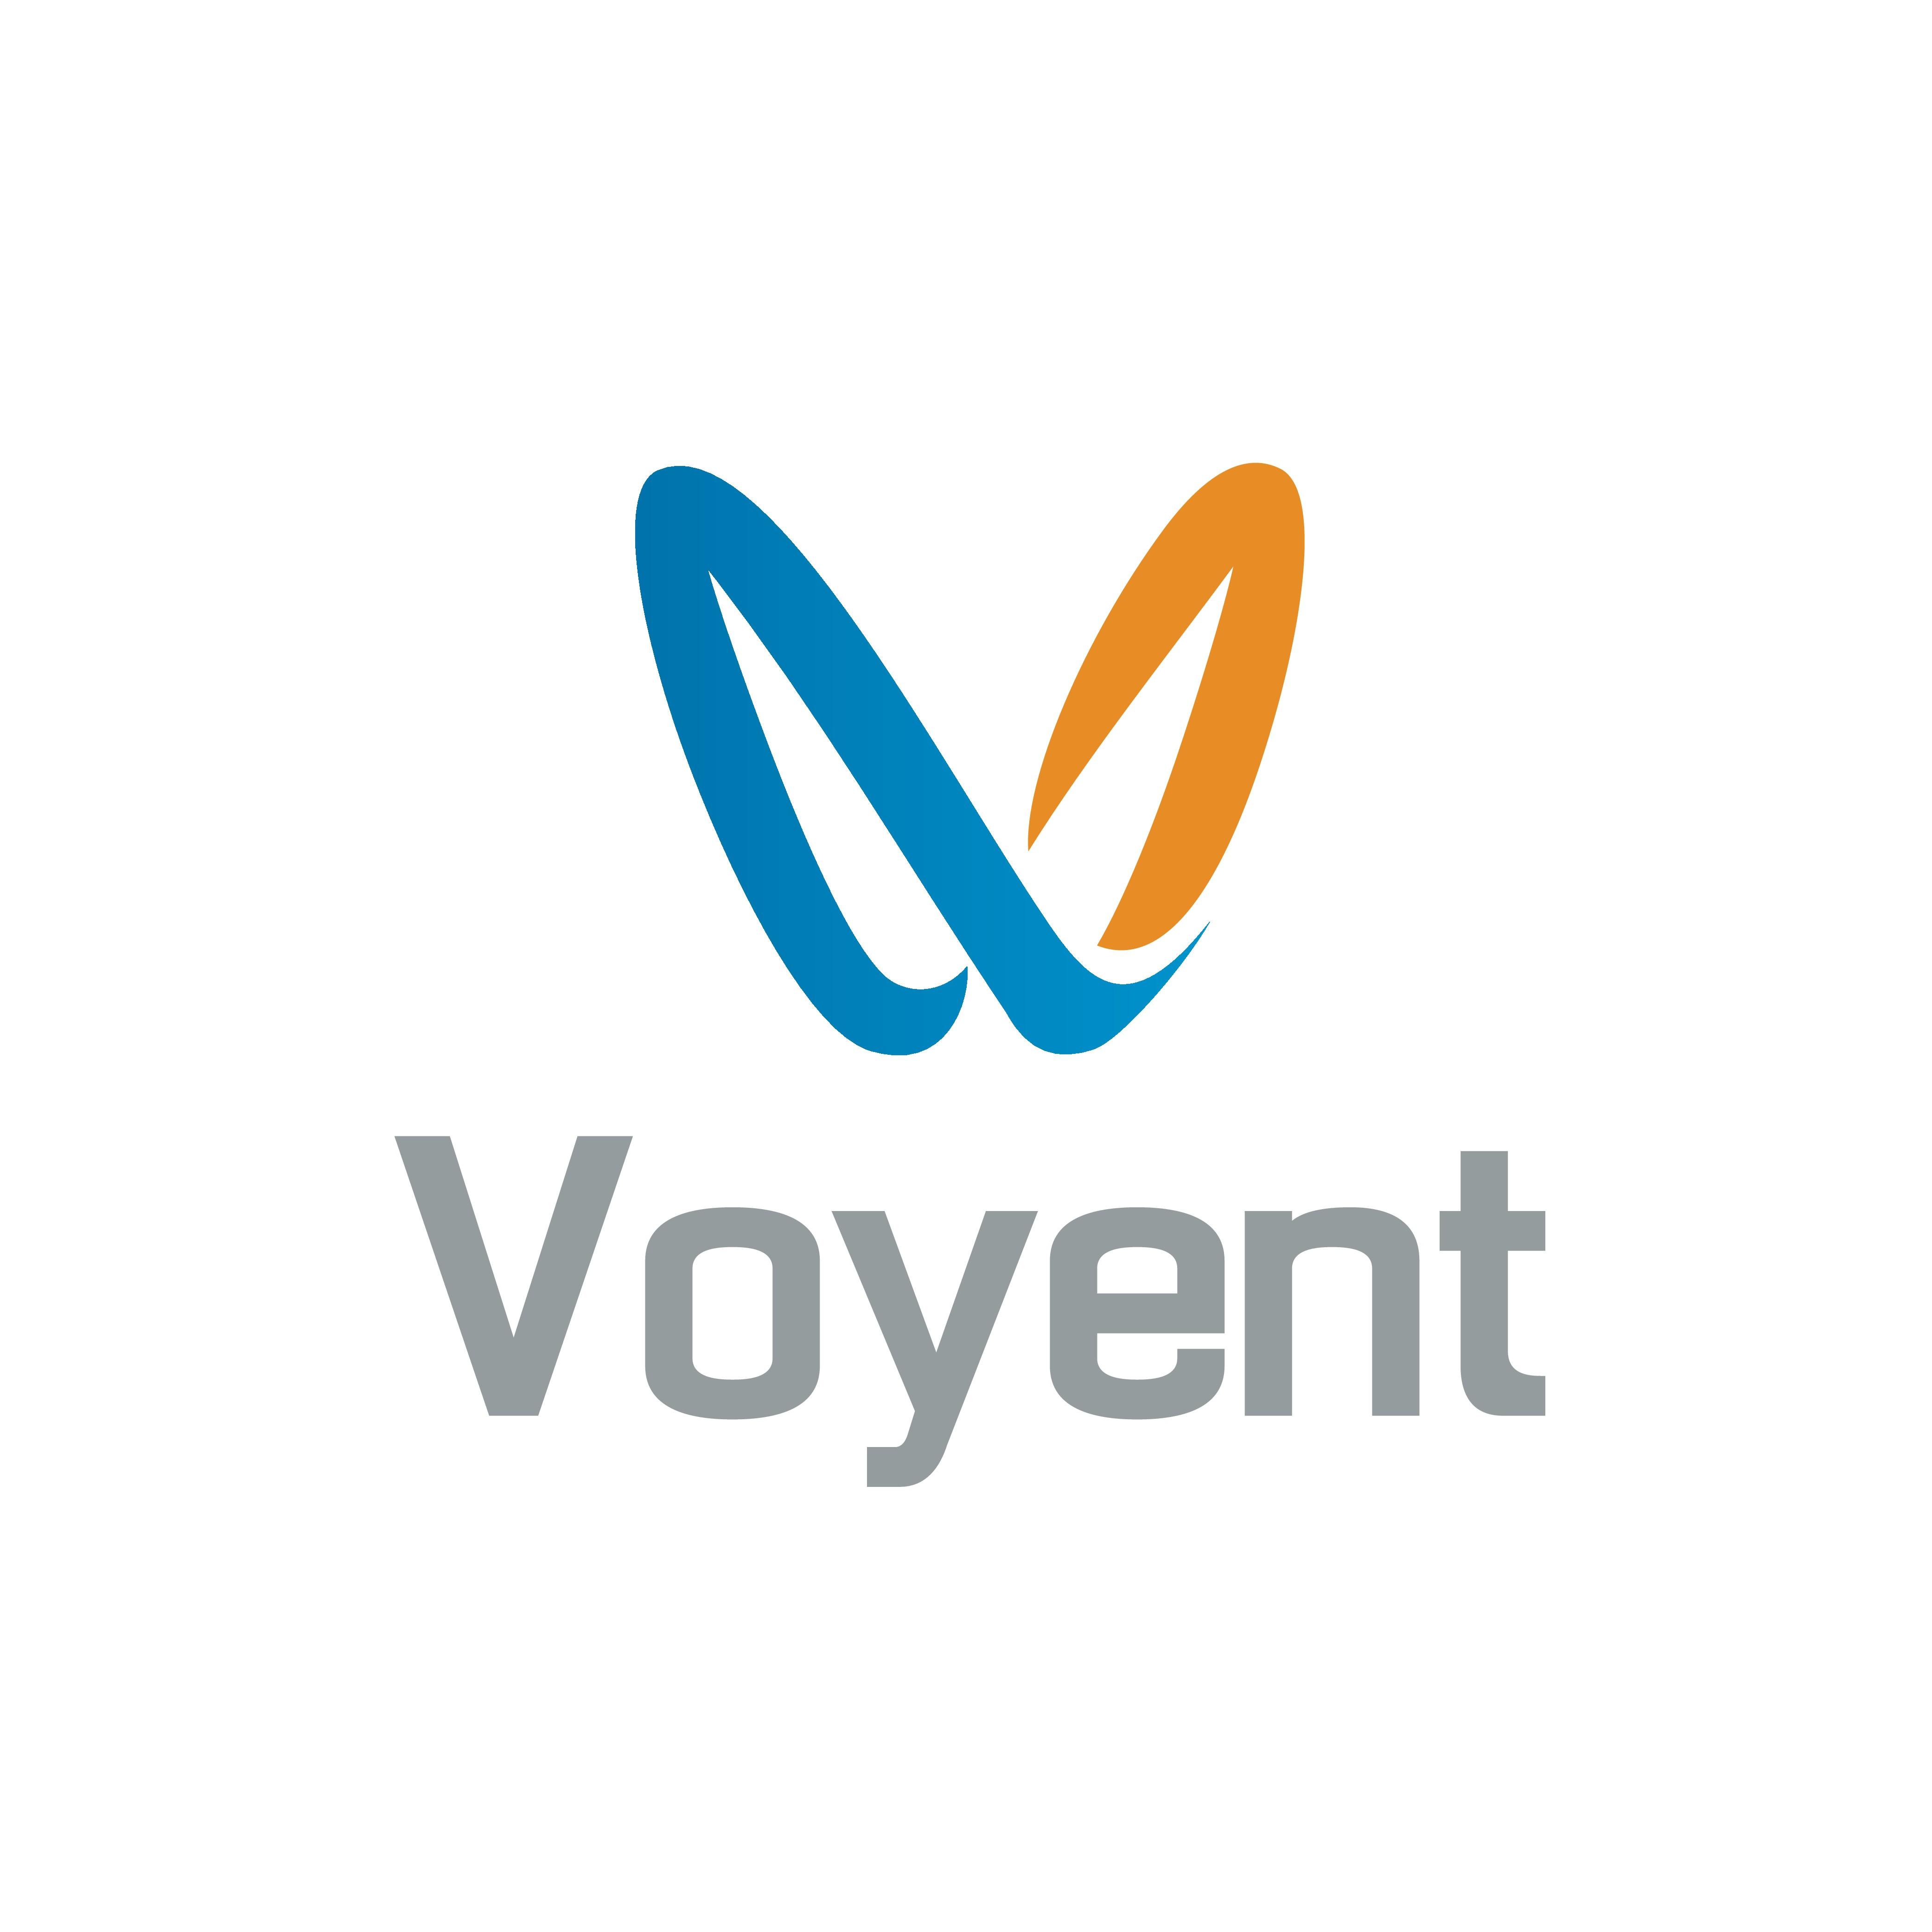 Create an innovative logo for Voyent